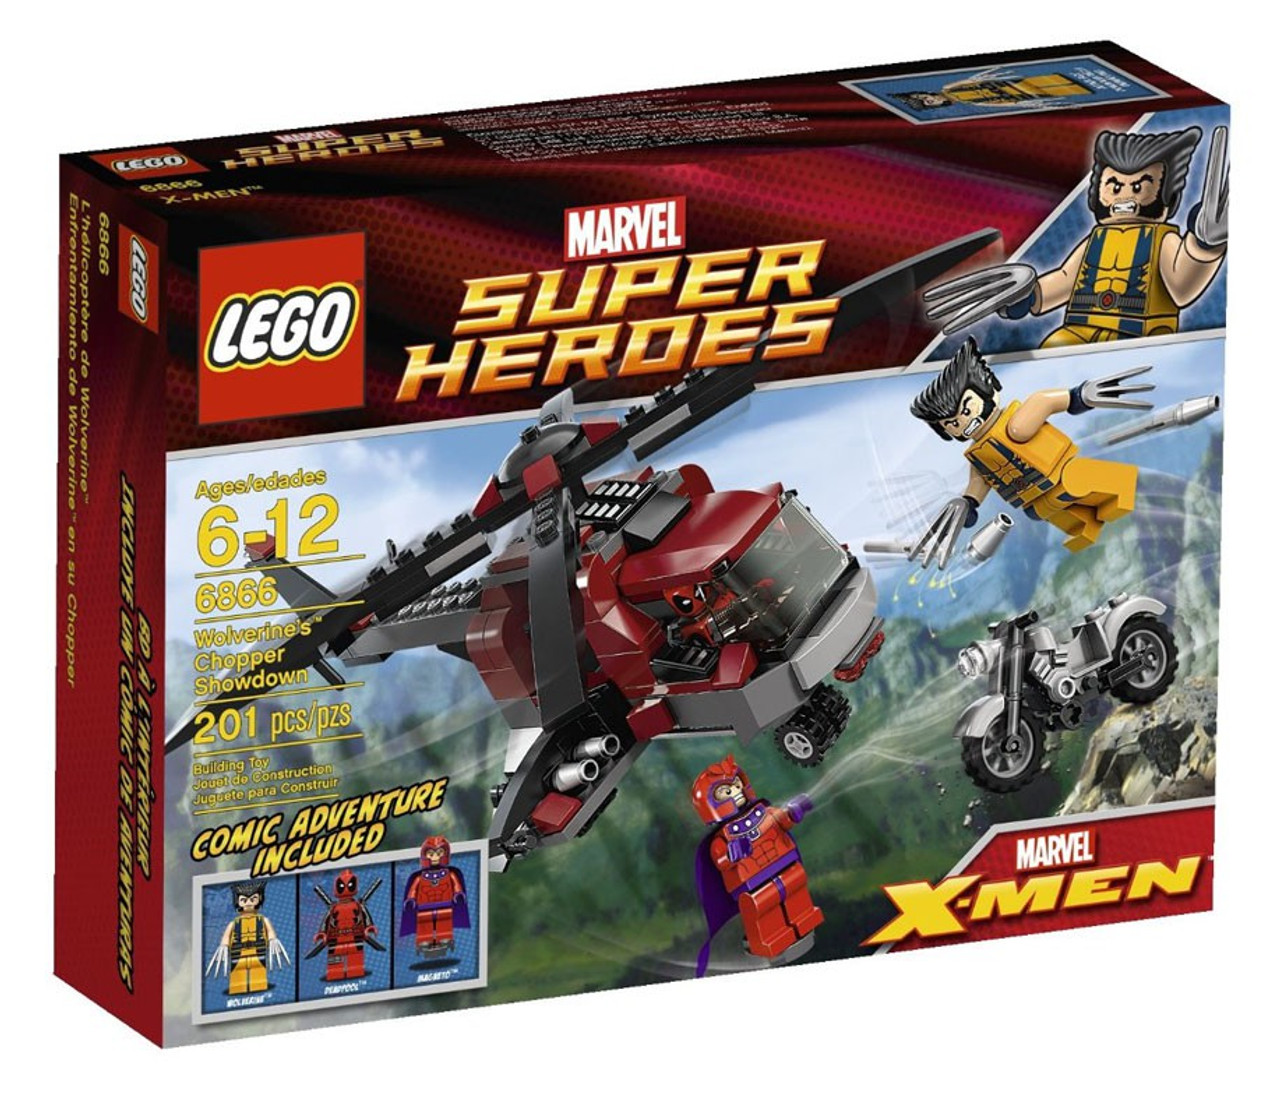 LEGO Marvel Super Heroes X-Men Wolverine's Chopper Showdown Set #6866